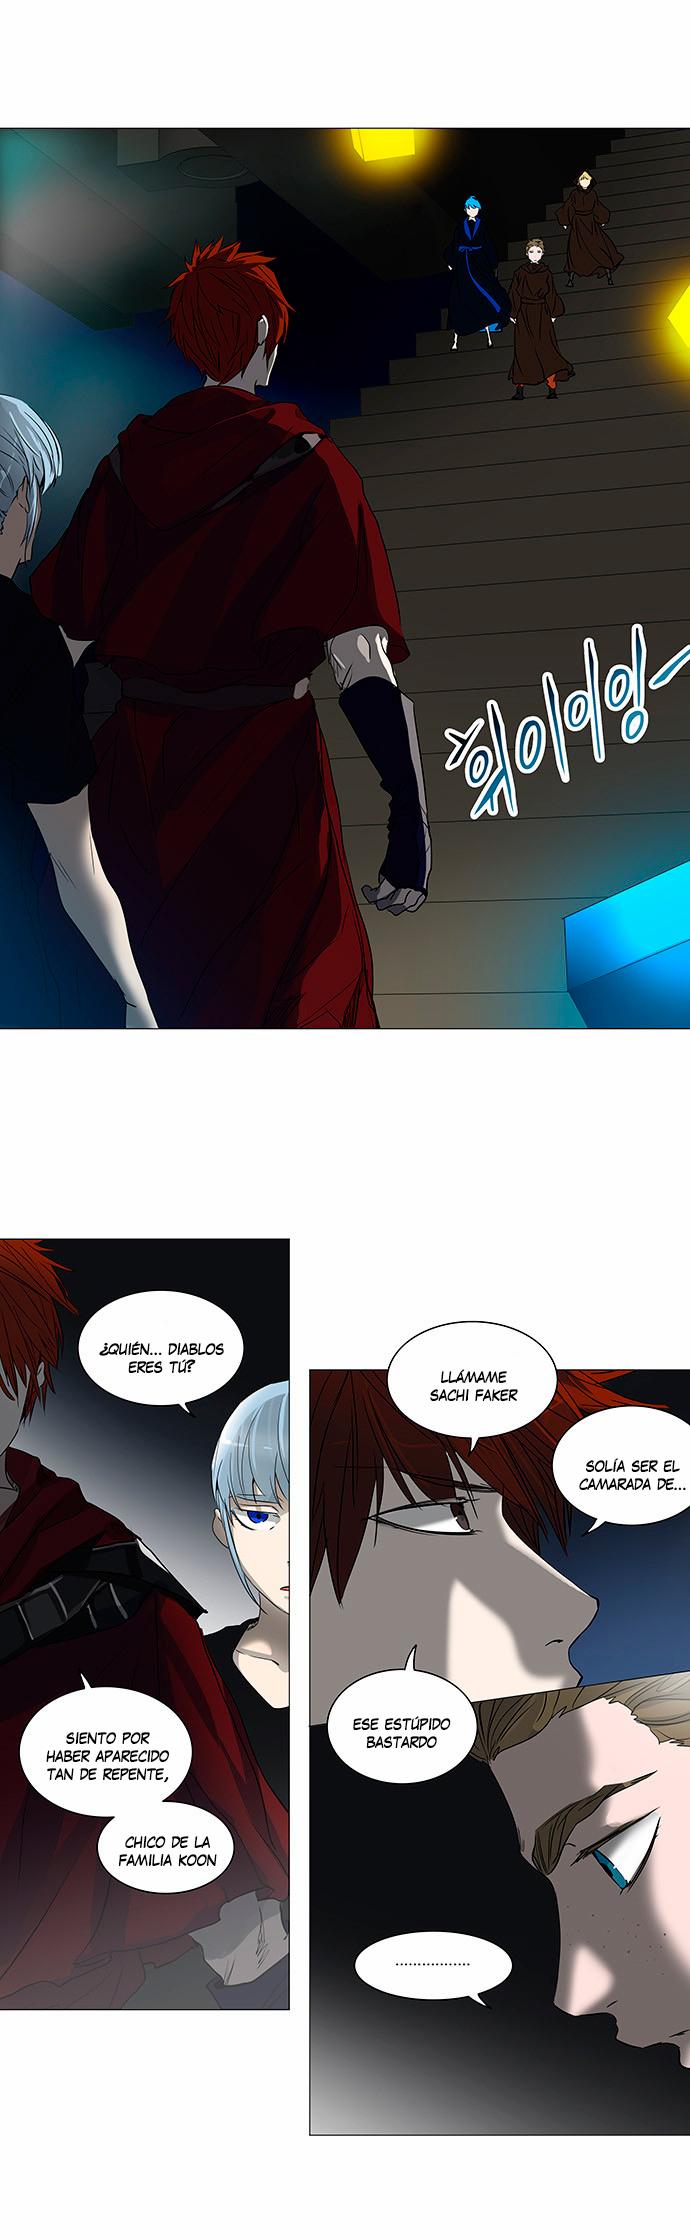 http://c5.ninemanga.com/es_manga/21/149/396507/a990d7a6b3327afe16cff8e7bfa58114.jpg Page 2